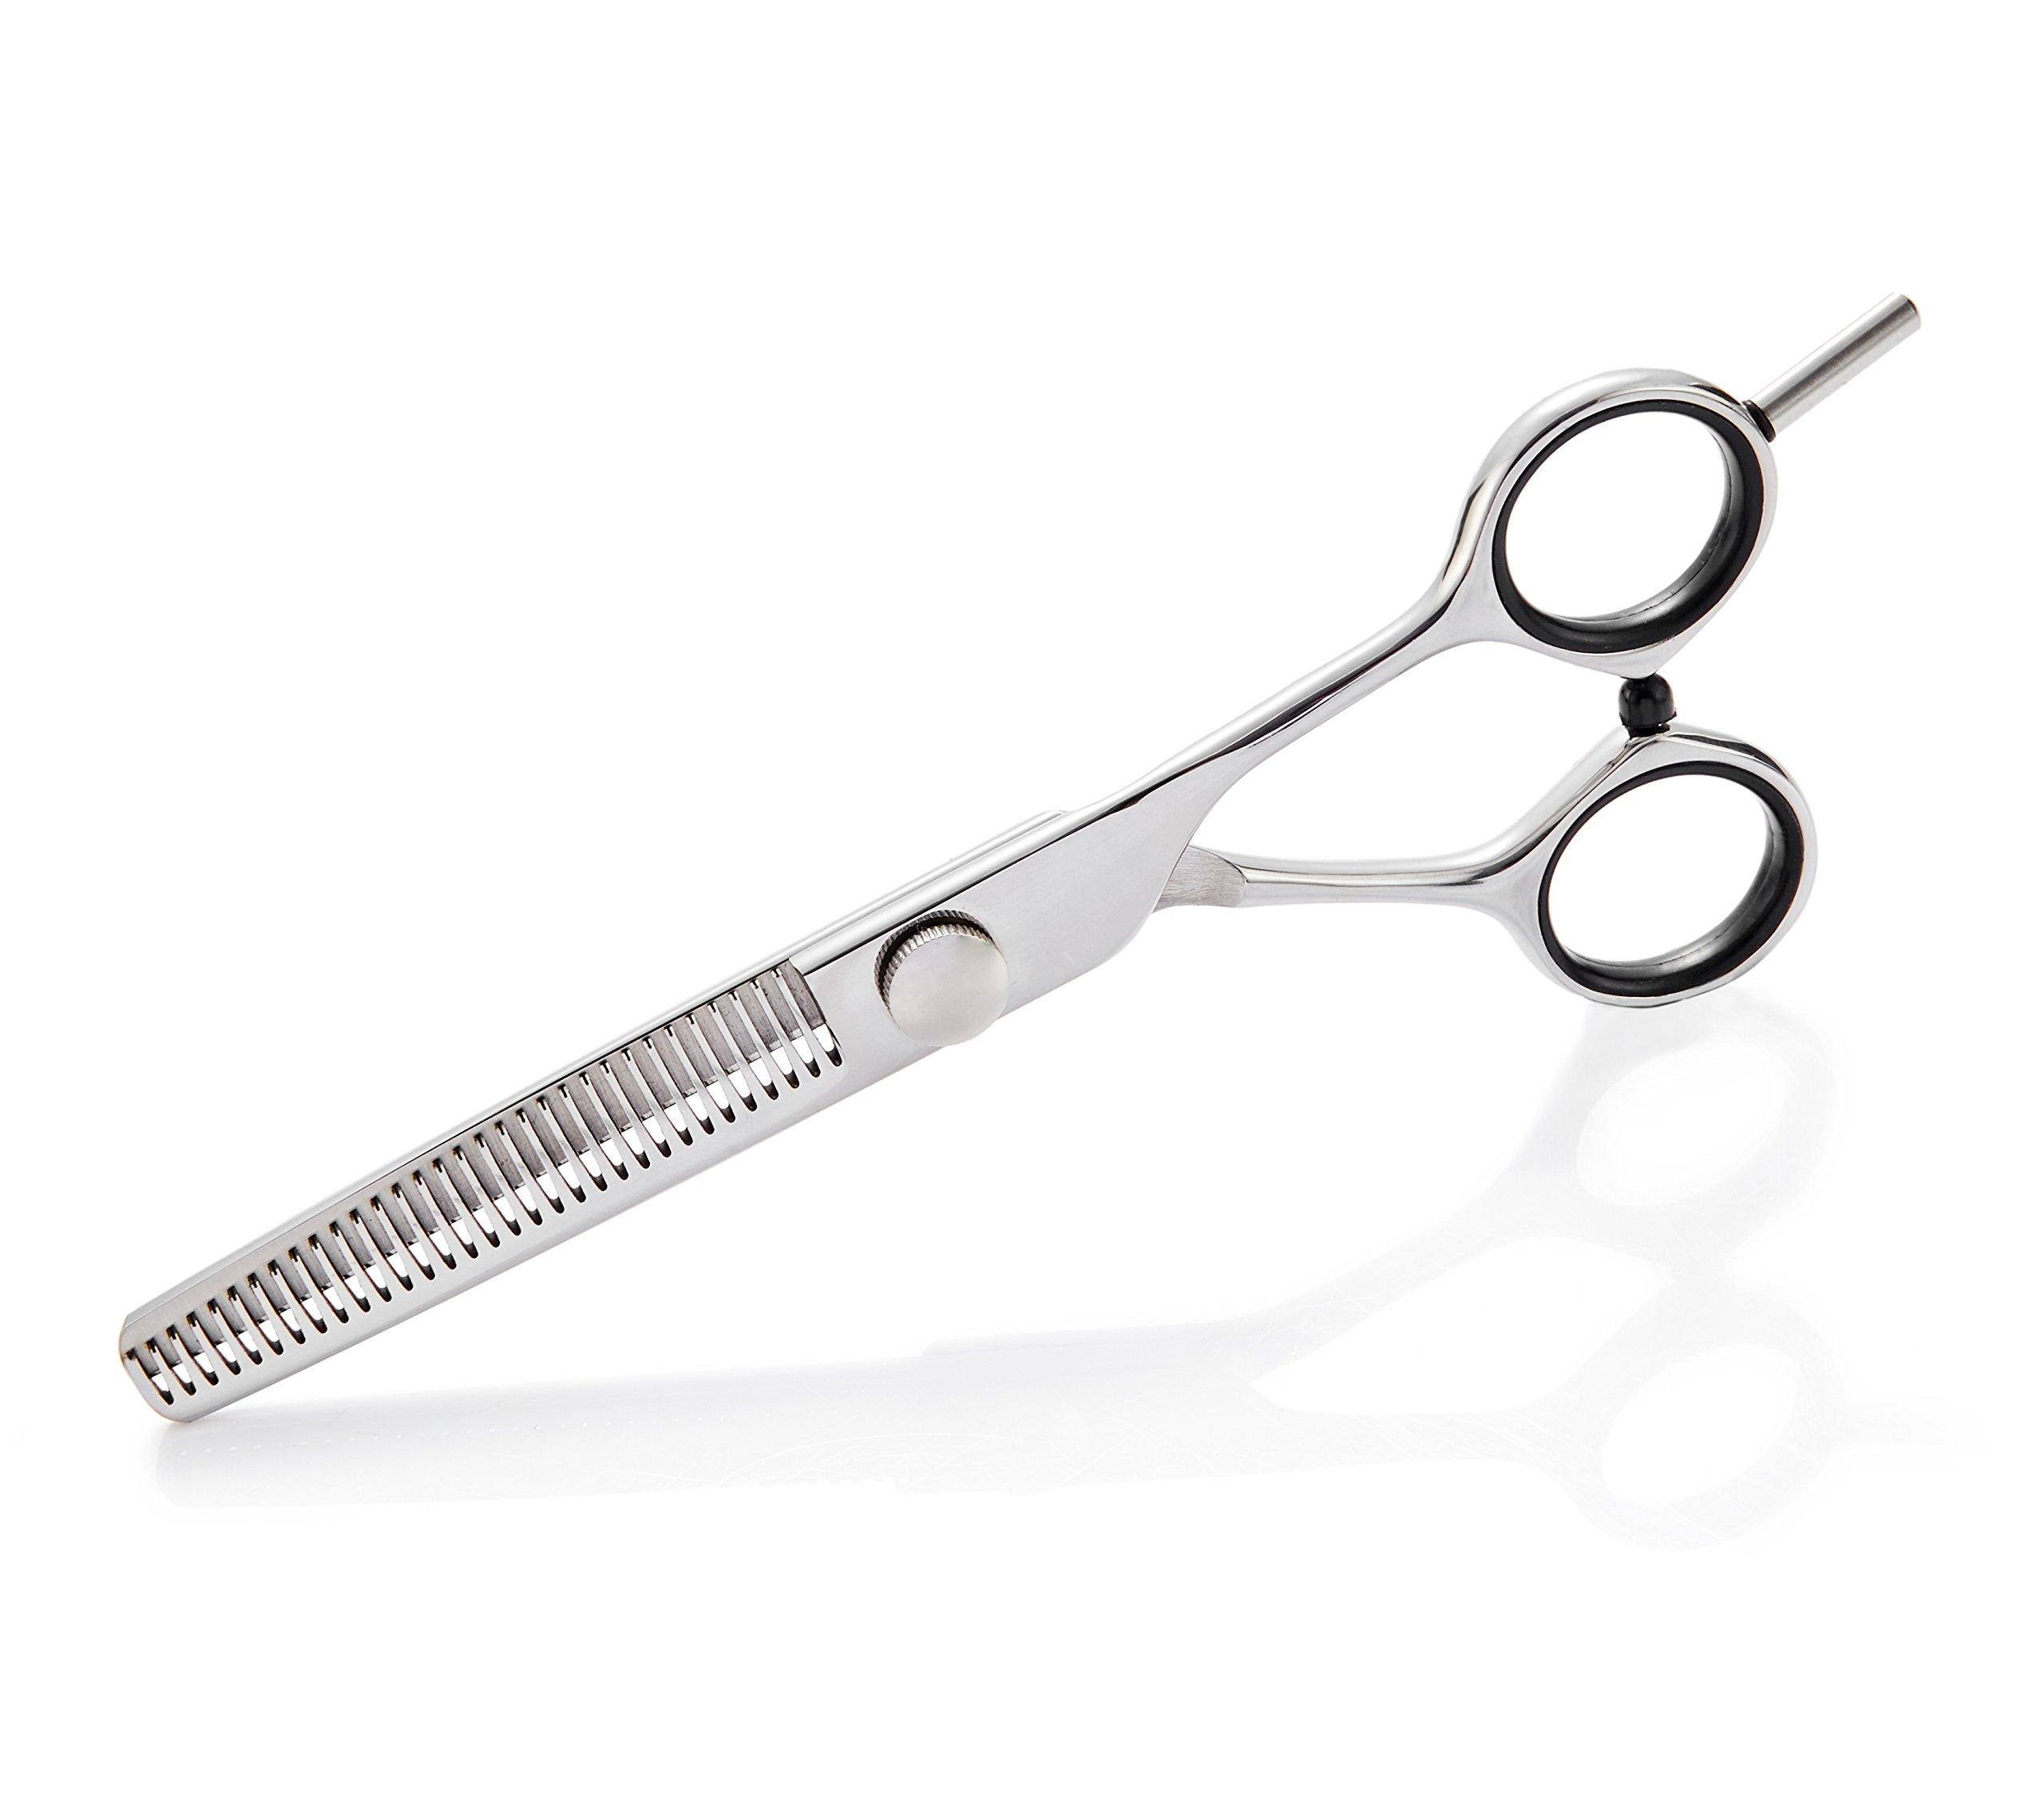 2018 Professional Hair Cutting Scissors Set,Japanese 6.5 Inch Hair Scissors Teflon Shears Hairdressing Scissors Barber Thinning Scissors Hairdresser Razor Edge Haircut Right hand use by JAVENPROLIU (Image #7)